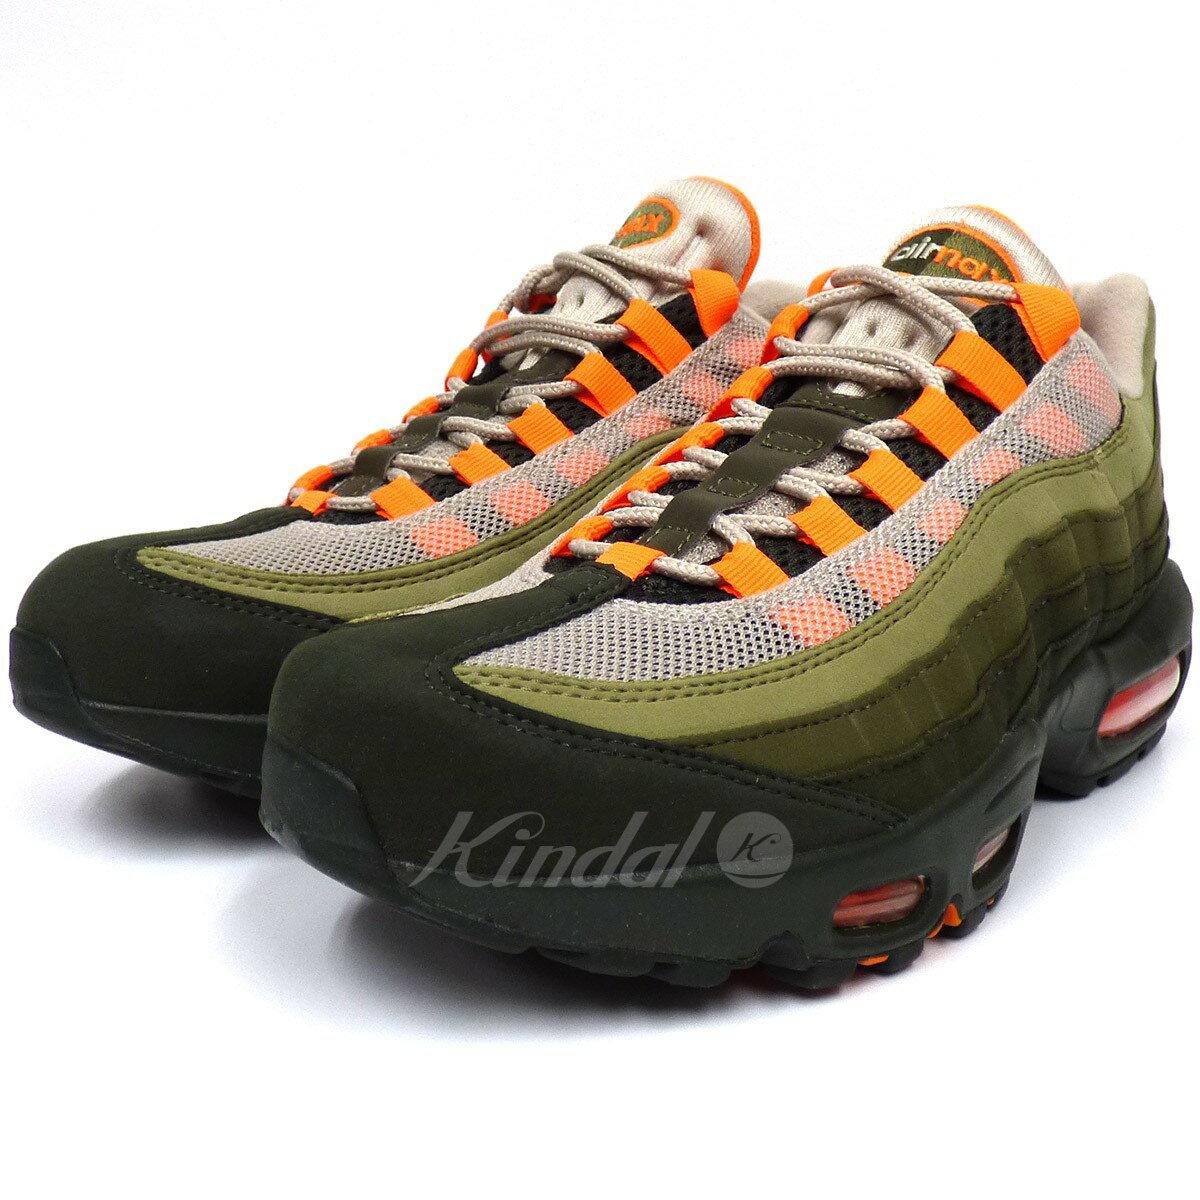 save off 2db50 e4918 NIKE AIR MAX95 Total Orange Air Max 95 sneakers khaki size: US7. 5 (25.5cm)  (Nike)